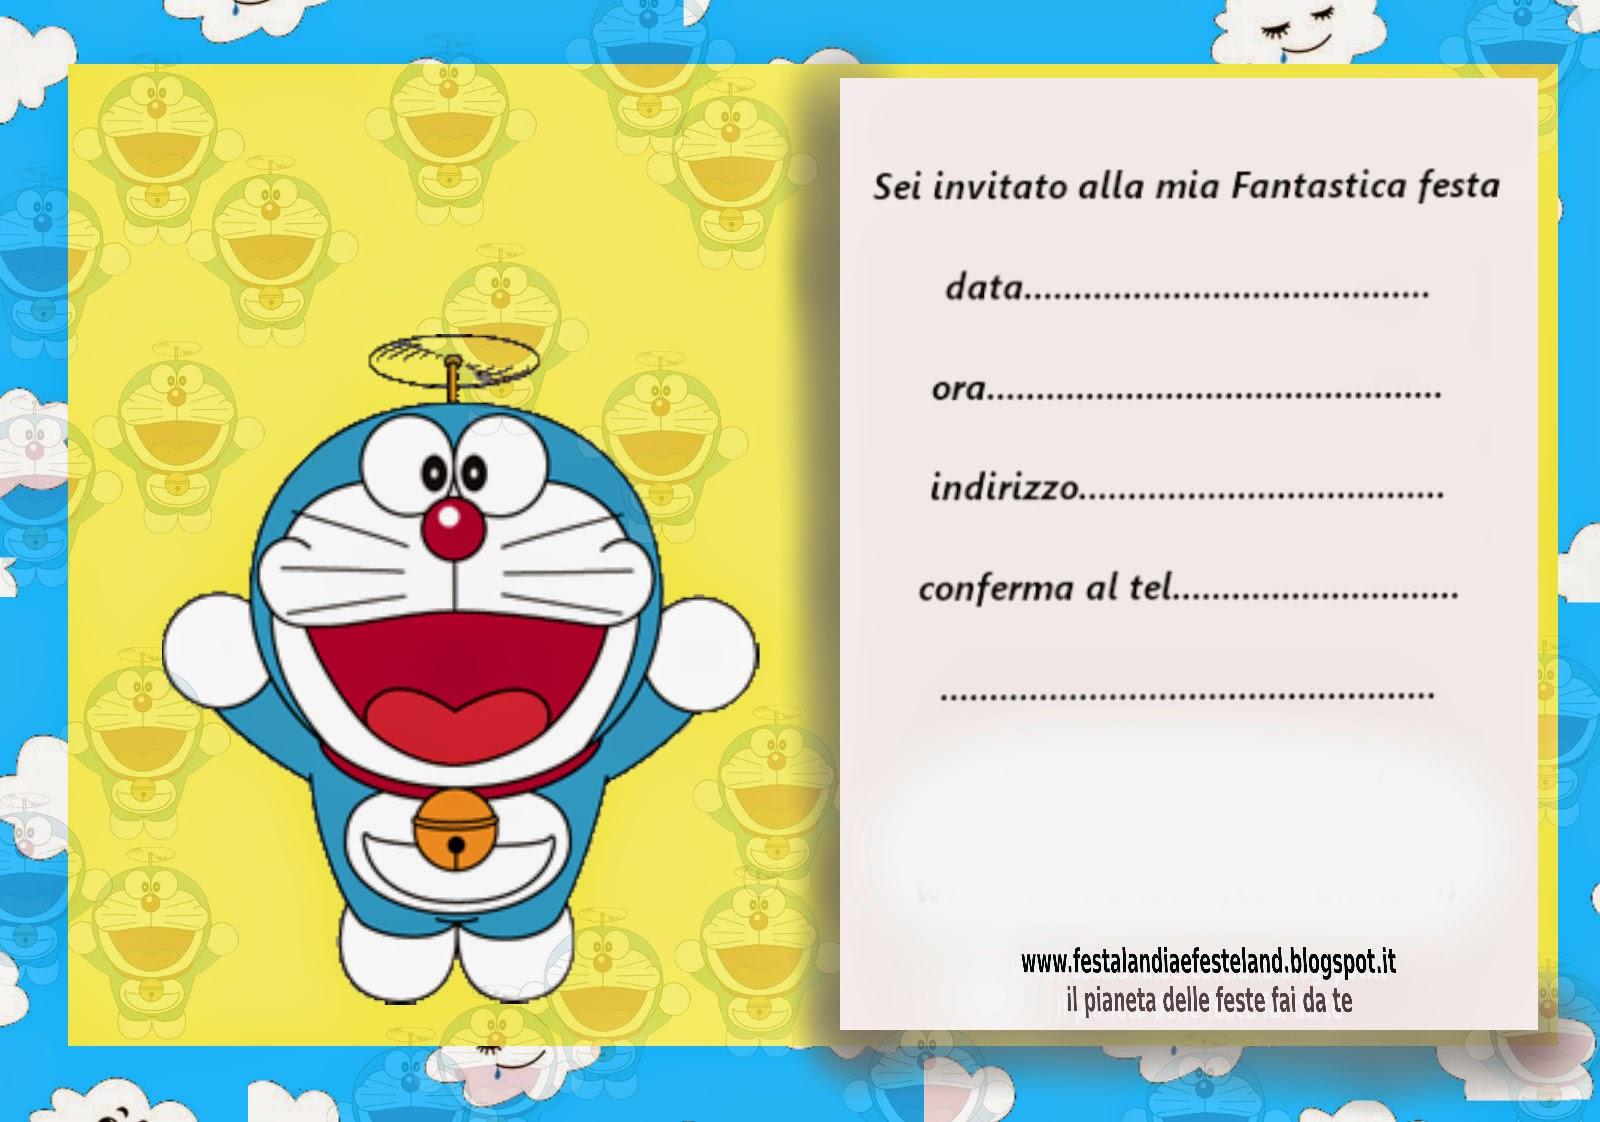 Festalandia e festeland doraemon party kit gratis for Doraemon immagini da colorare